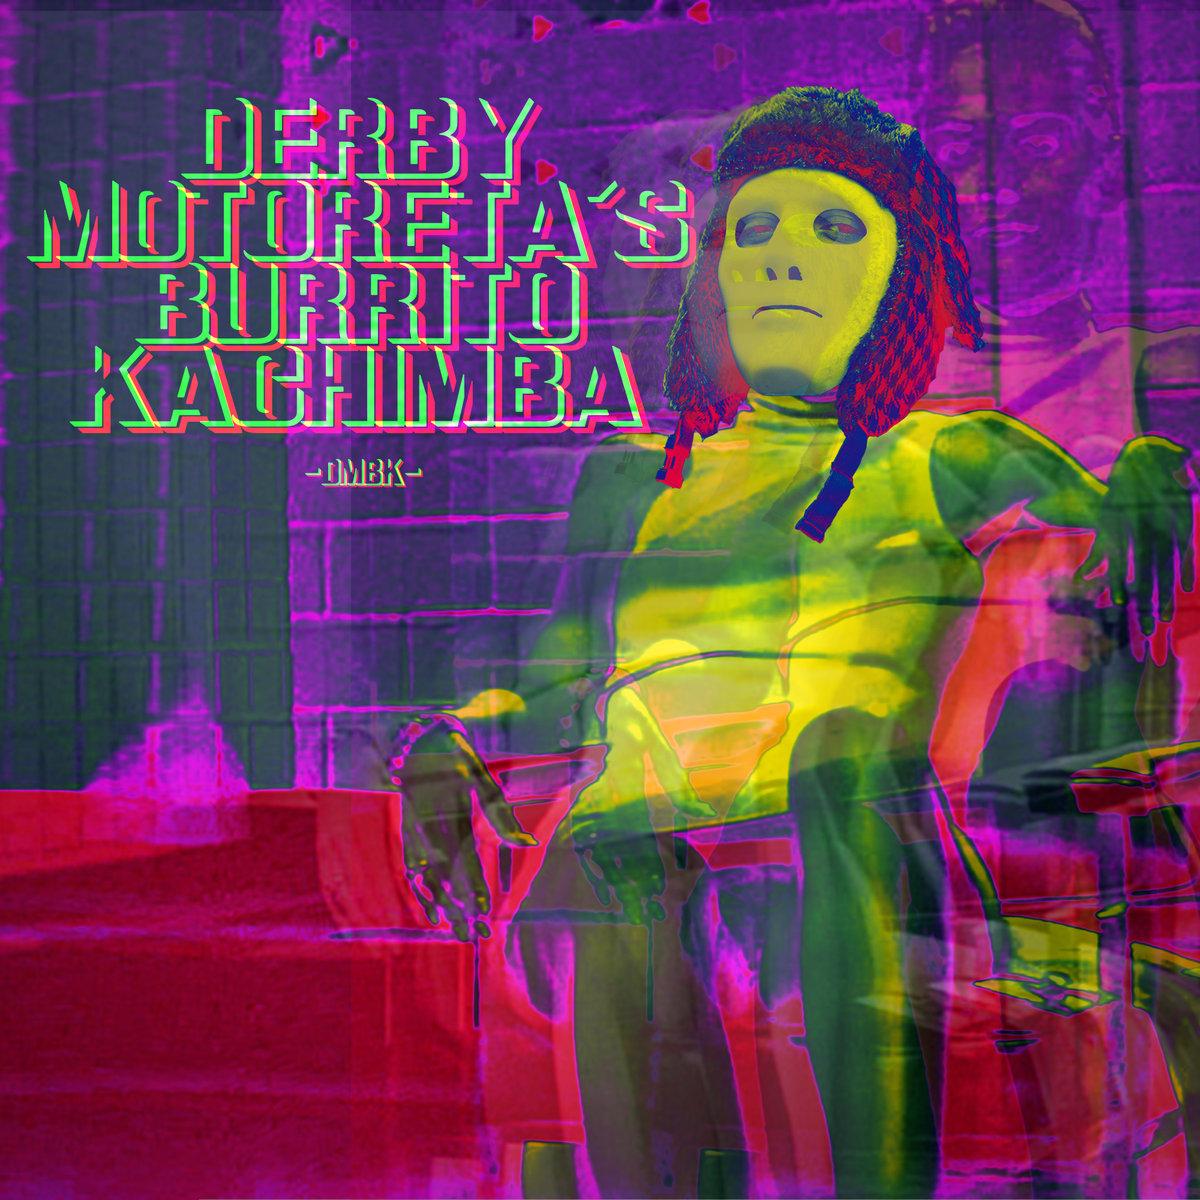 Derby Motoreta's Burrito Kachimba  - Página 13 A1787766844_10